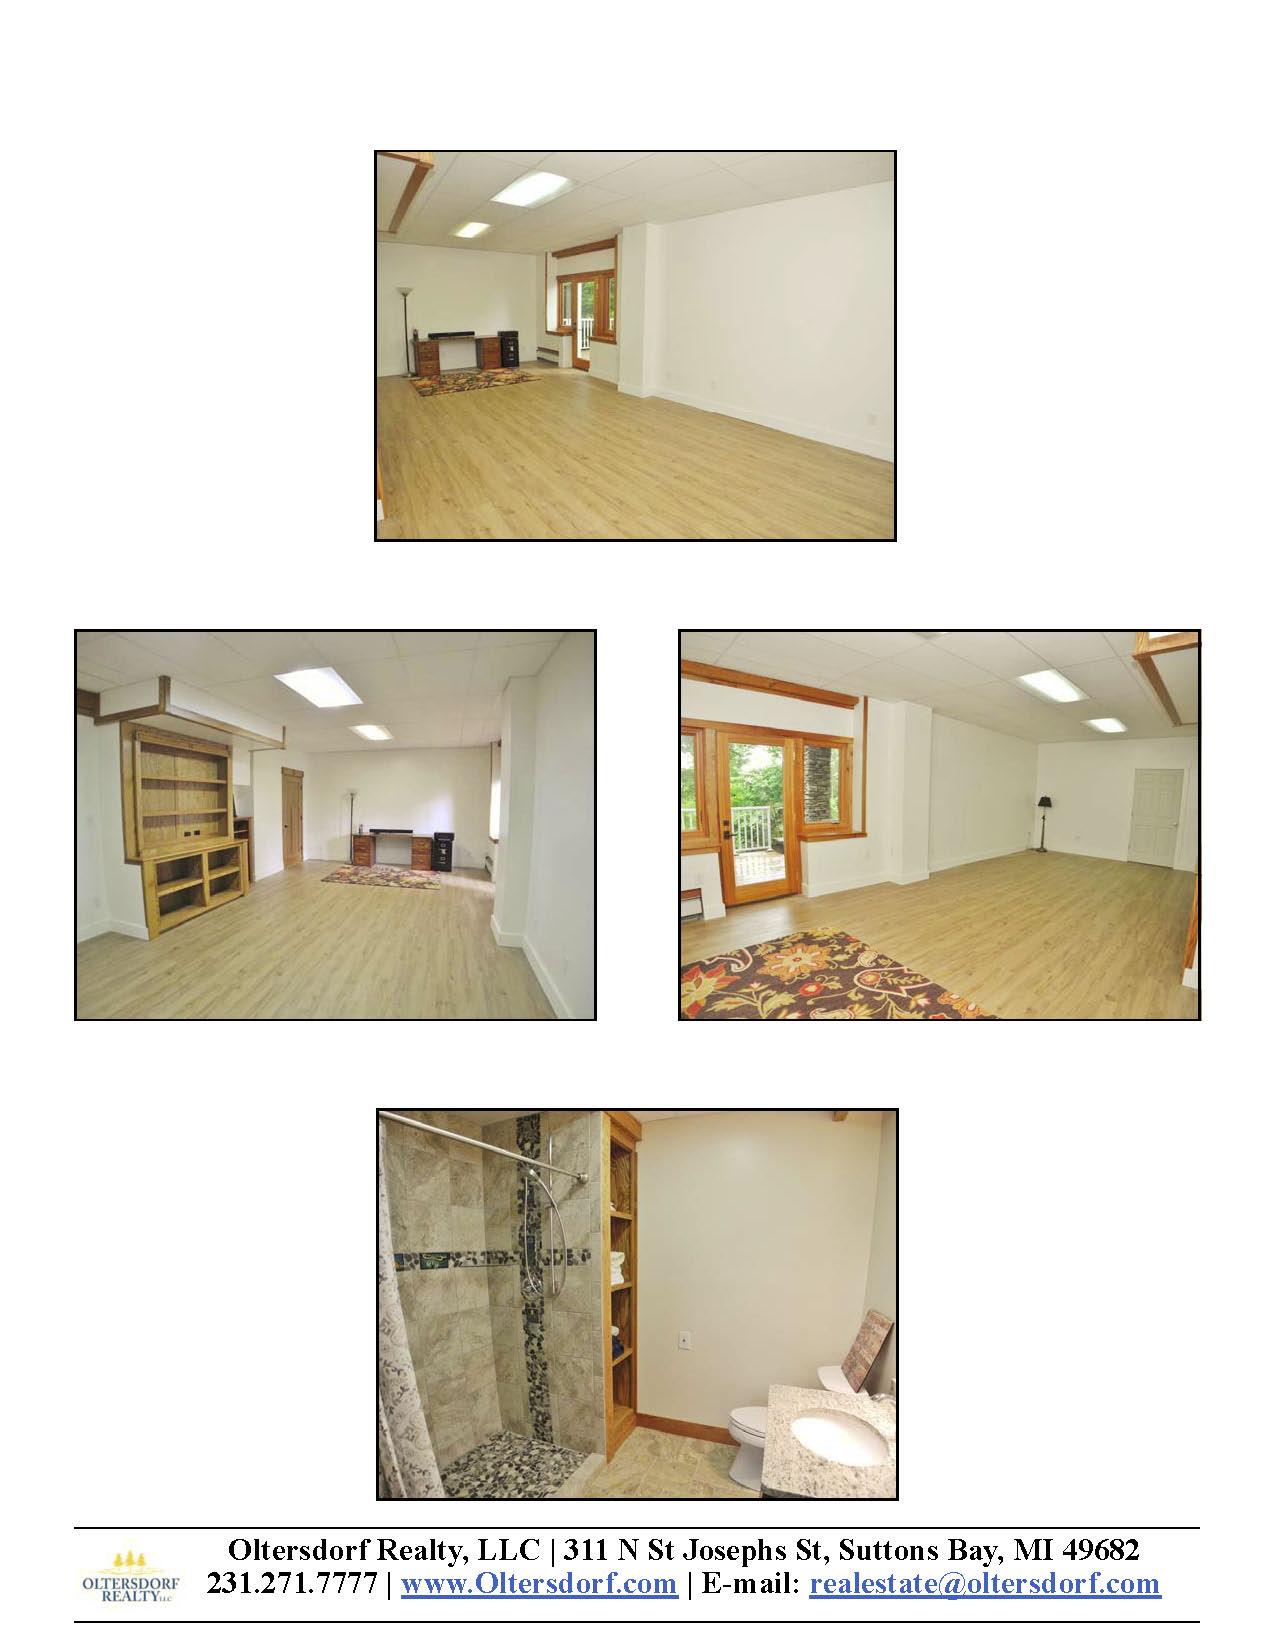 5500 E Hidden Beech, Cedar, MI - For sale by Oltersdorf Realty LLC - Marketing Packet (9).jpg